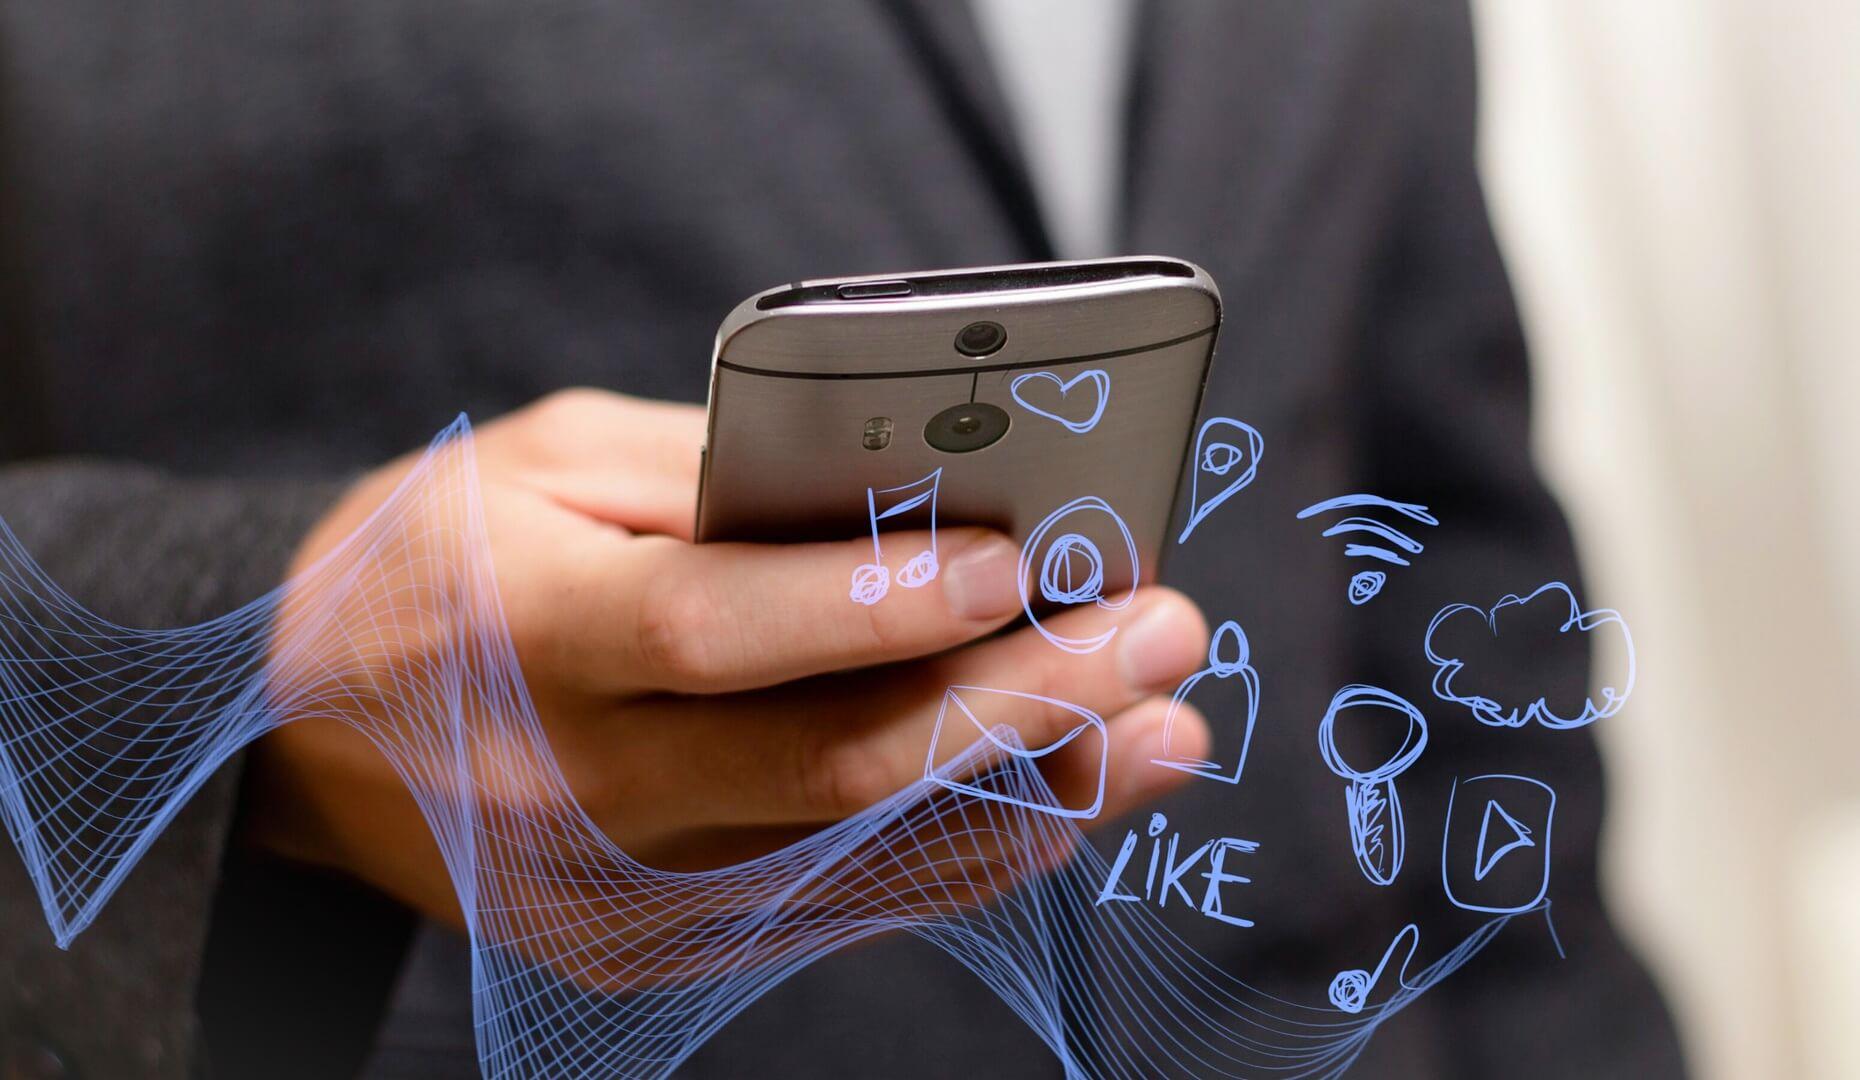 internet wifi verbonden connectiviteit smartphone social media 5g